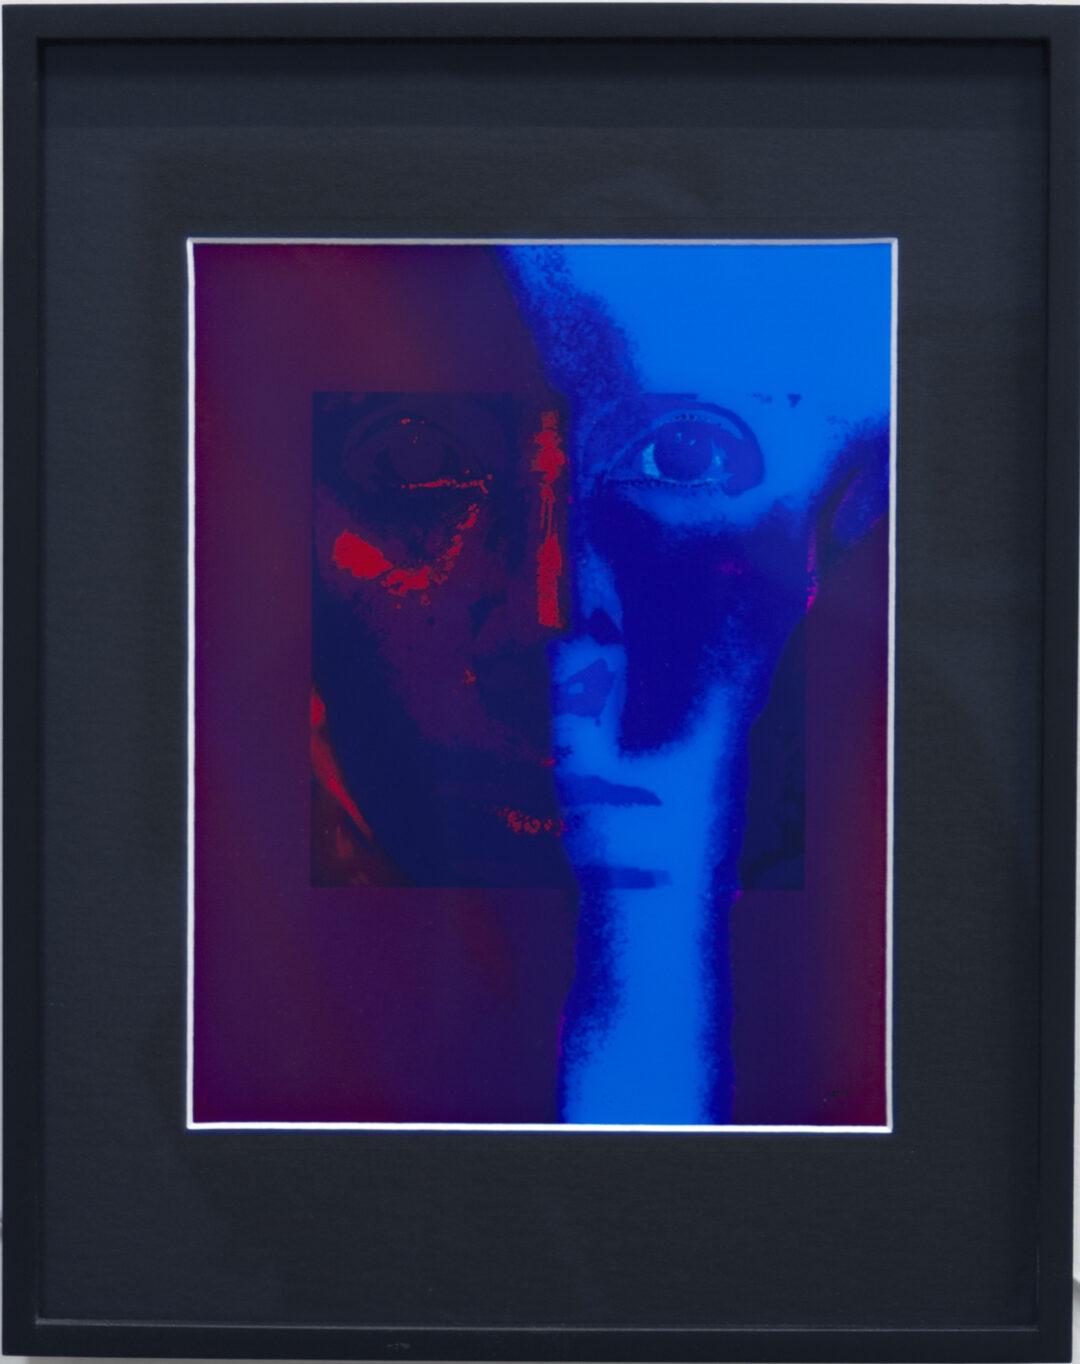 "Larry McCandlish ""Unmasked"" mixed media light Sculpture, Inkjet Die on paper, Wood, Glass, Custom Electronics, and Light 11 1/2"" W x 14 3/8""H, 2021, NFS"